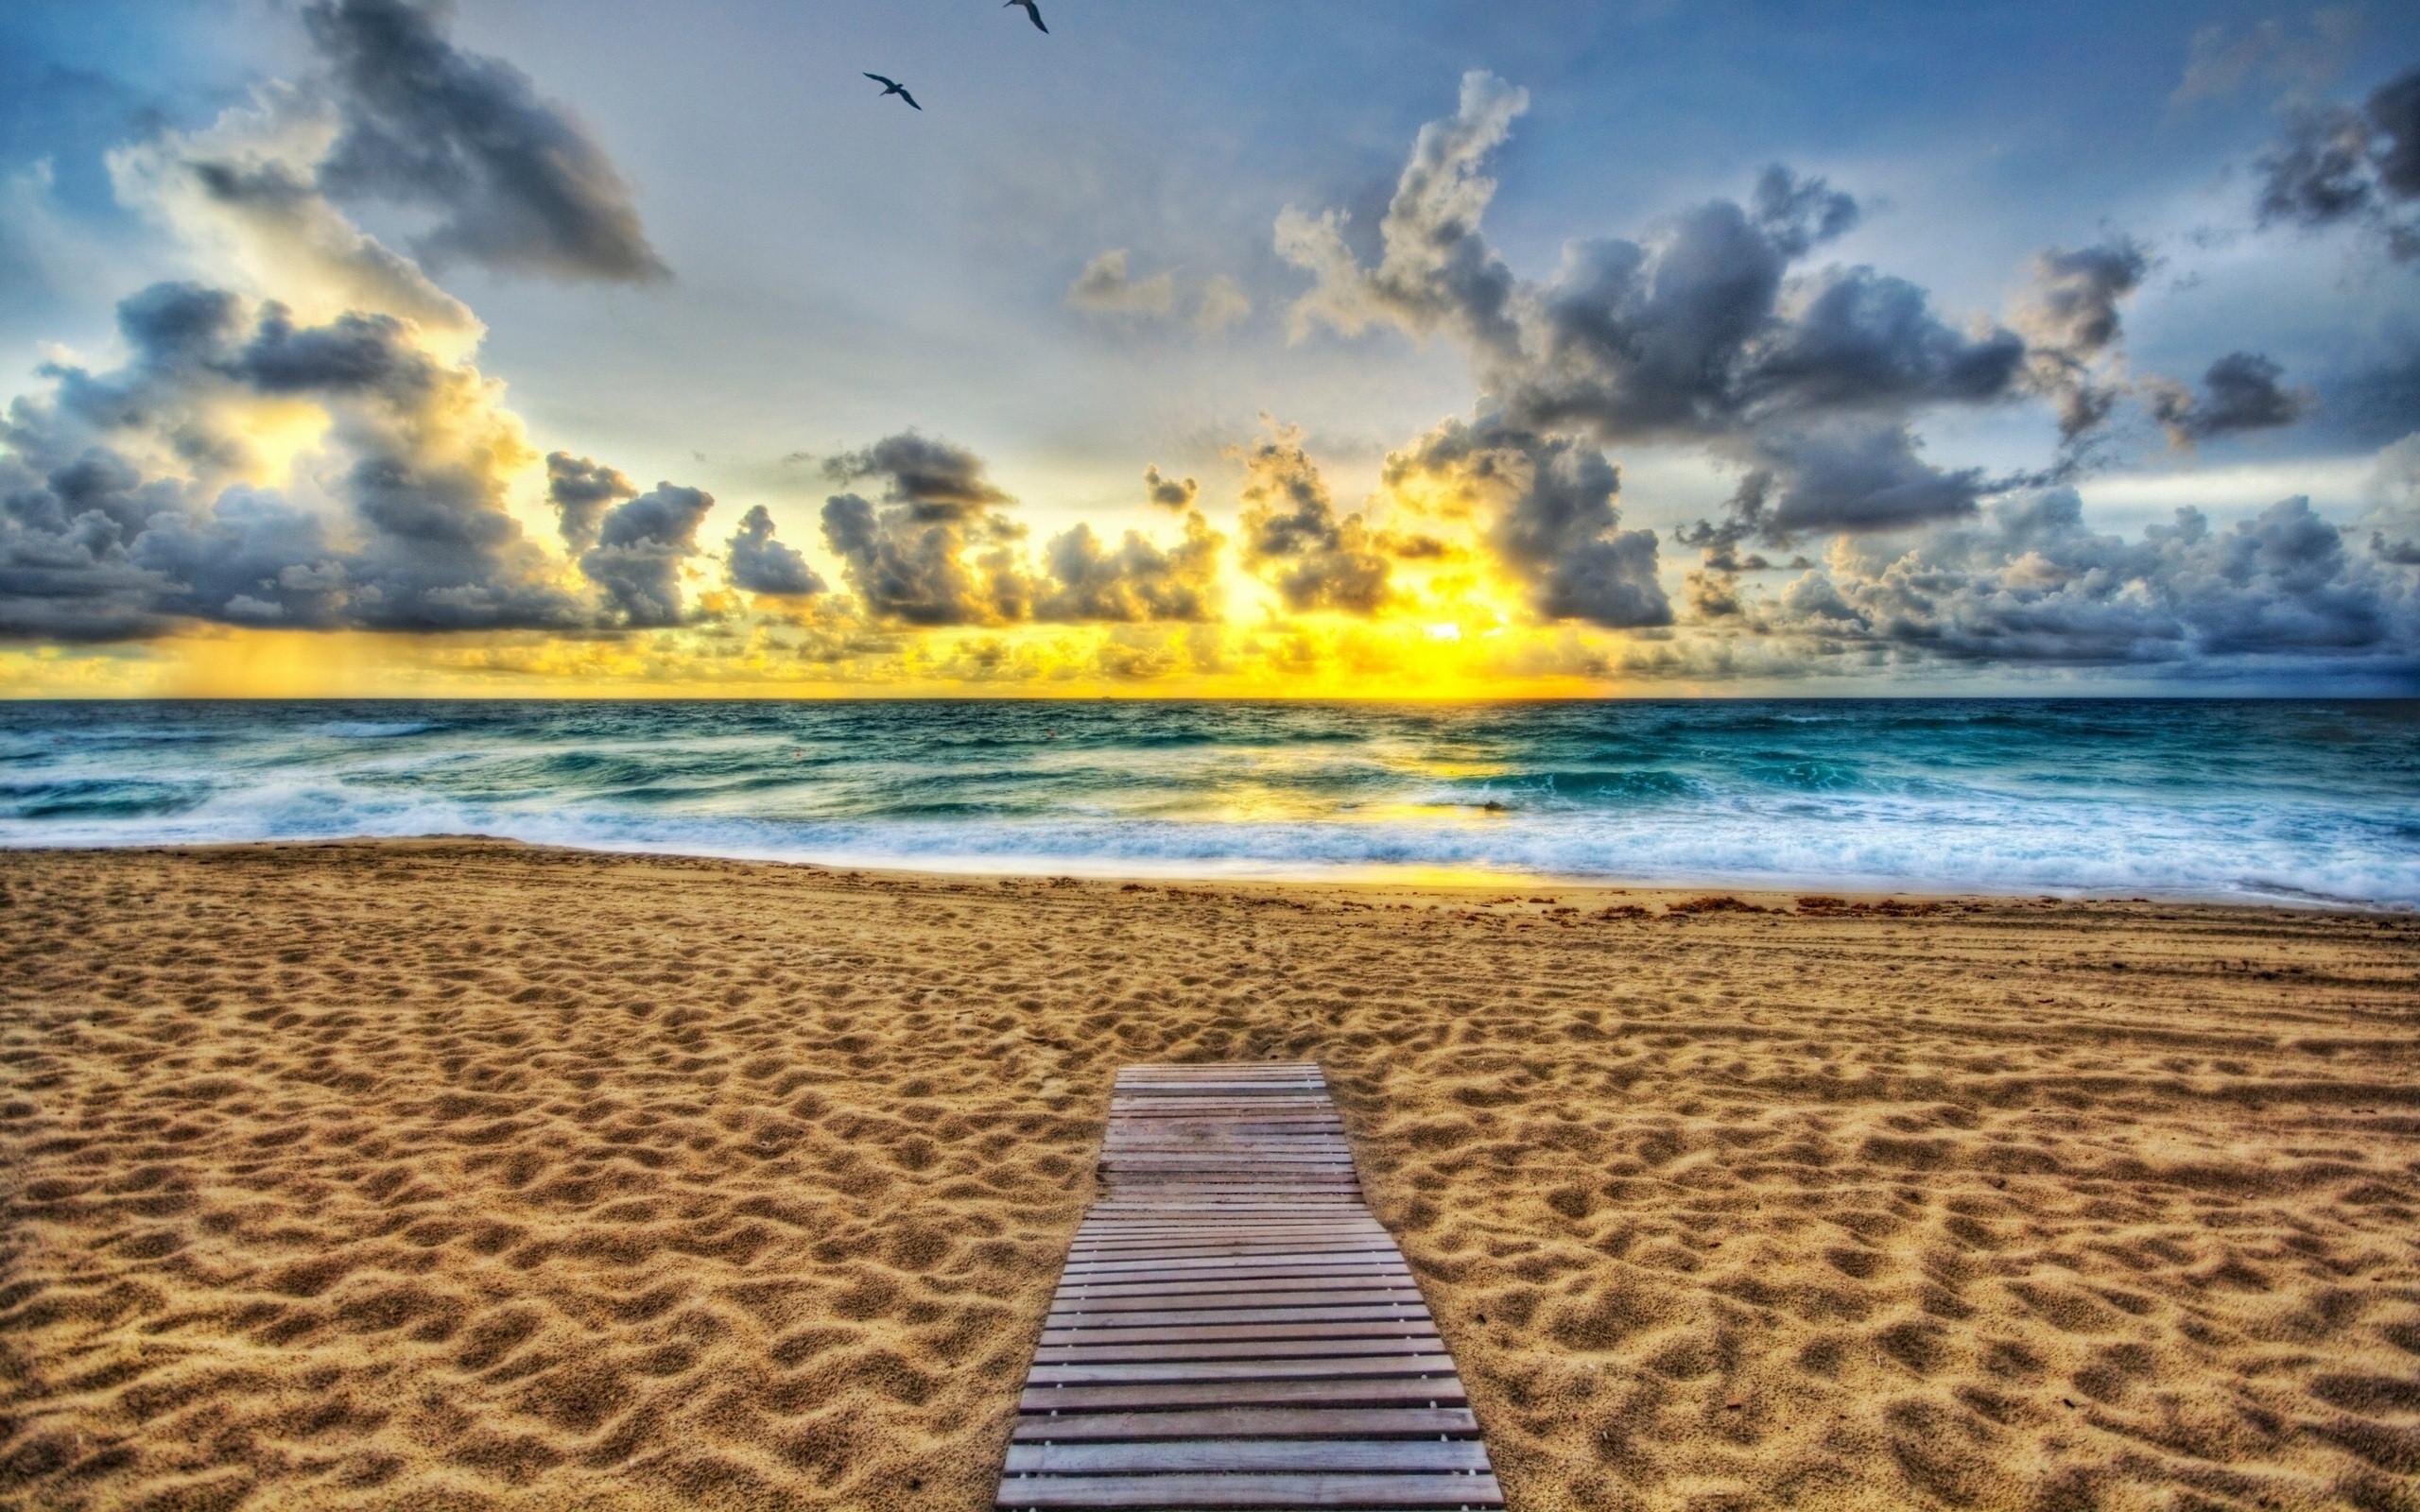 Waikiki Beach Wallpaper 60 images 2560x1600